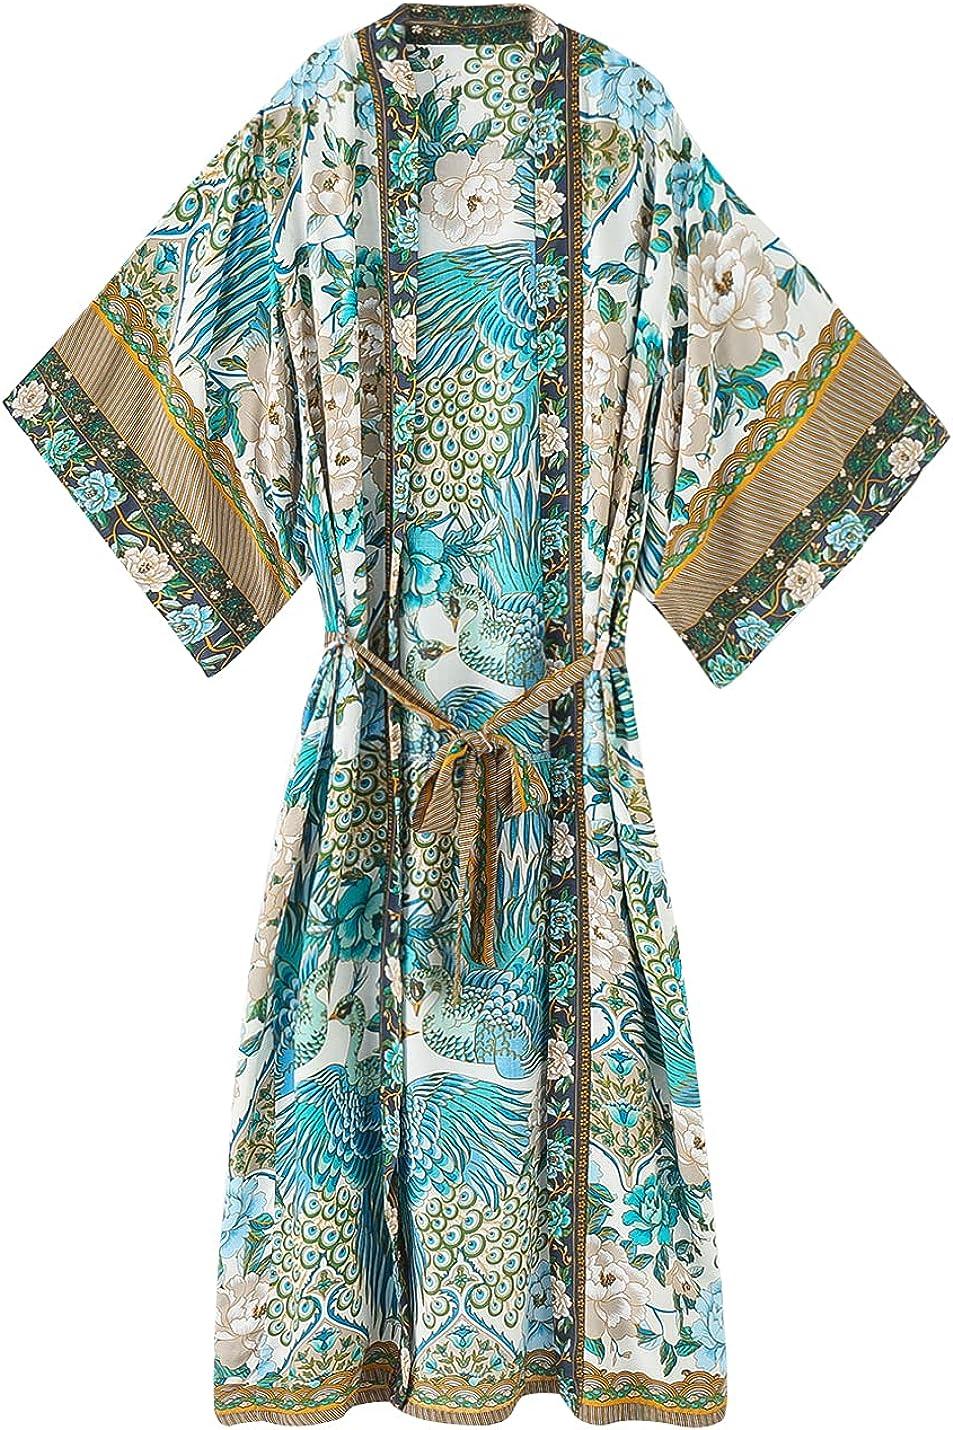 新作 大人気 SHAREYOIU Women's 公式通販 Kimono Long Robe Floral Peacock Ope Print Boho